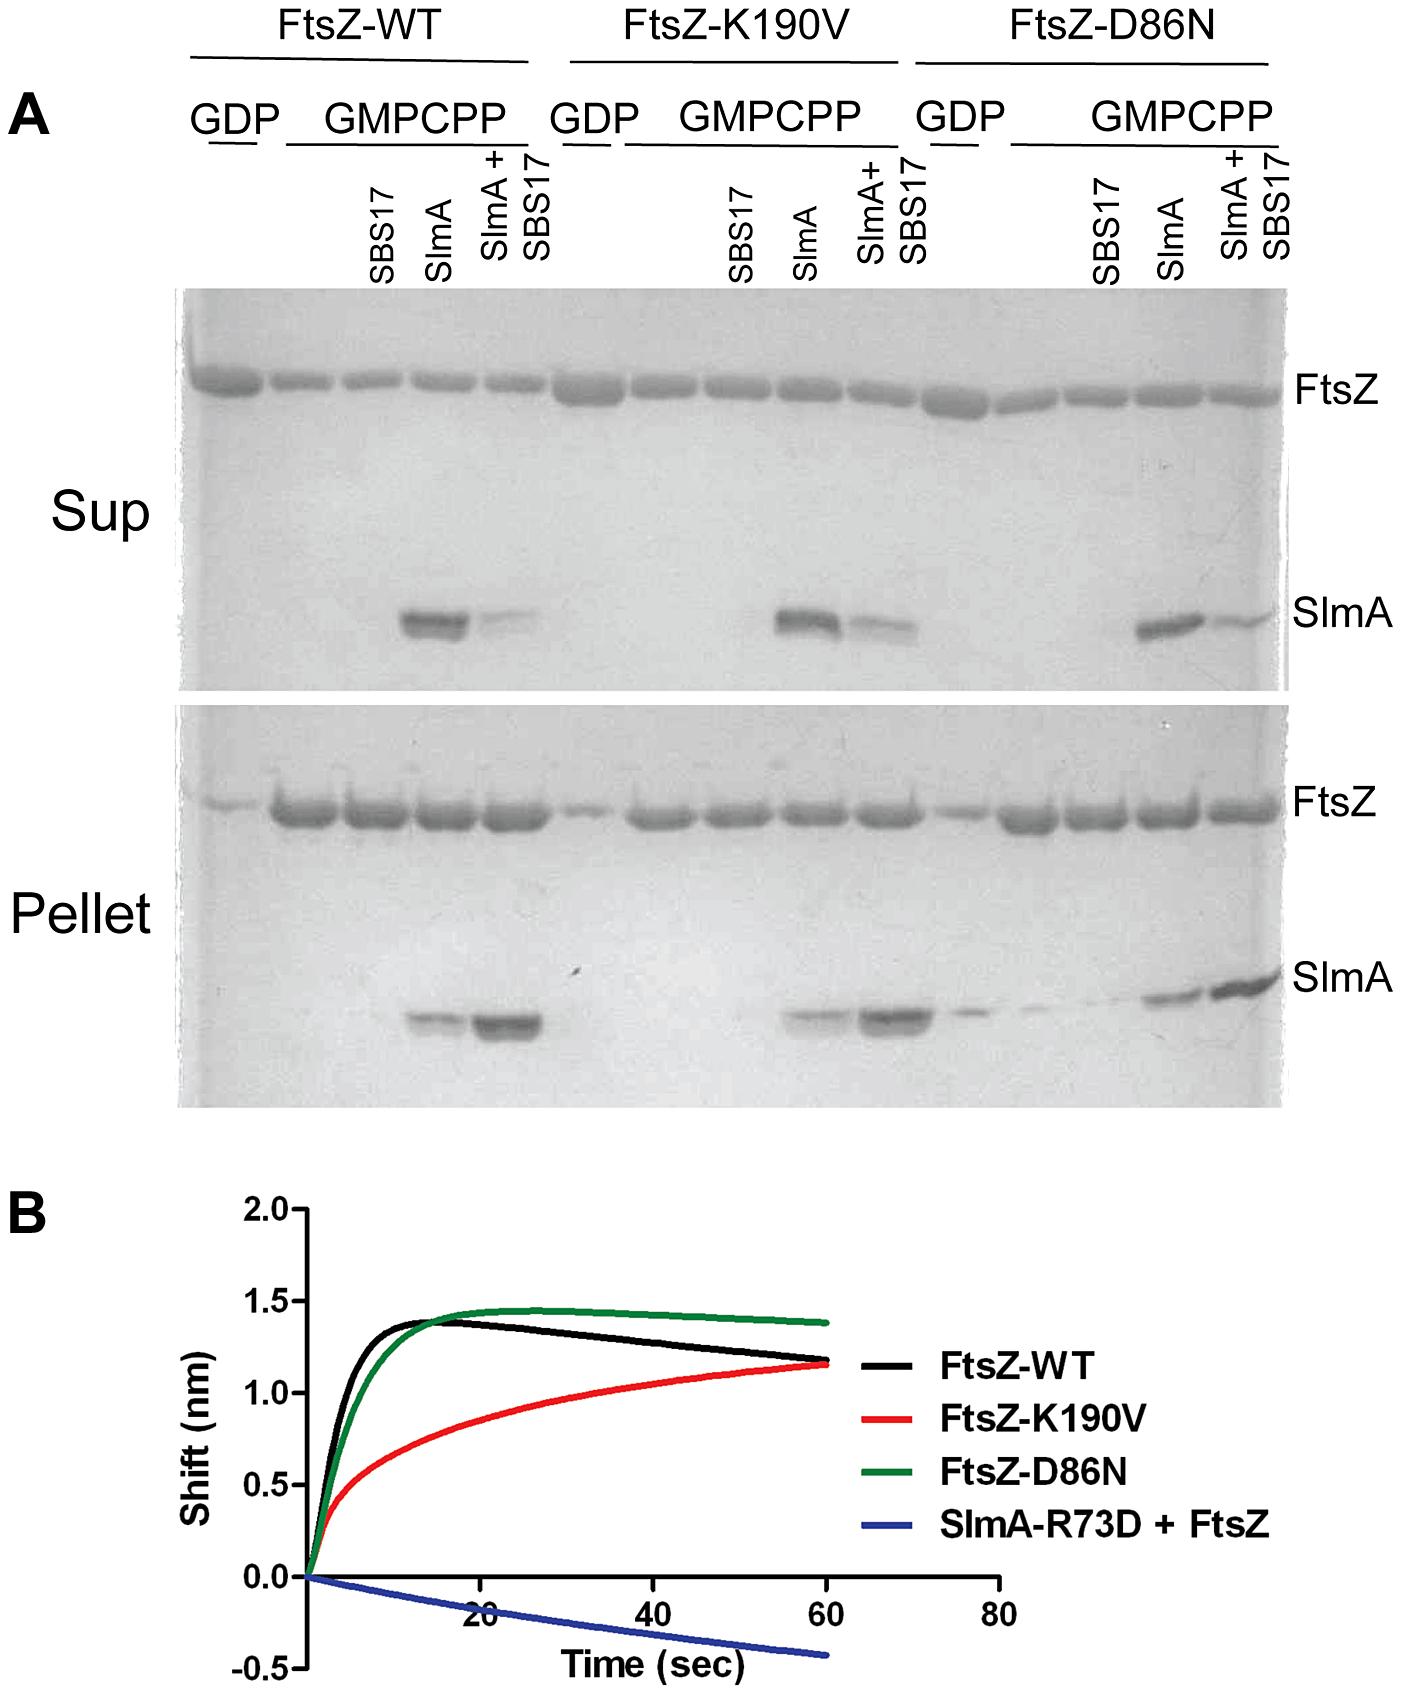 FtsZ-K190V and FtsZ-D86N bind SlmA.